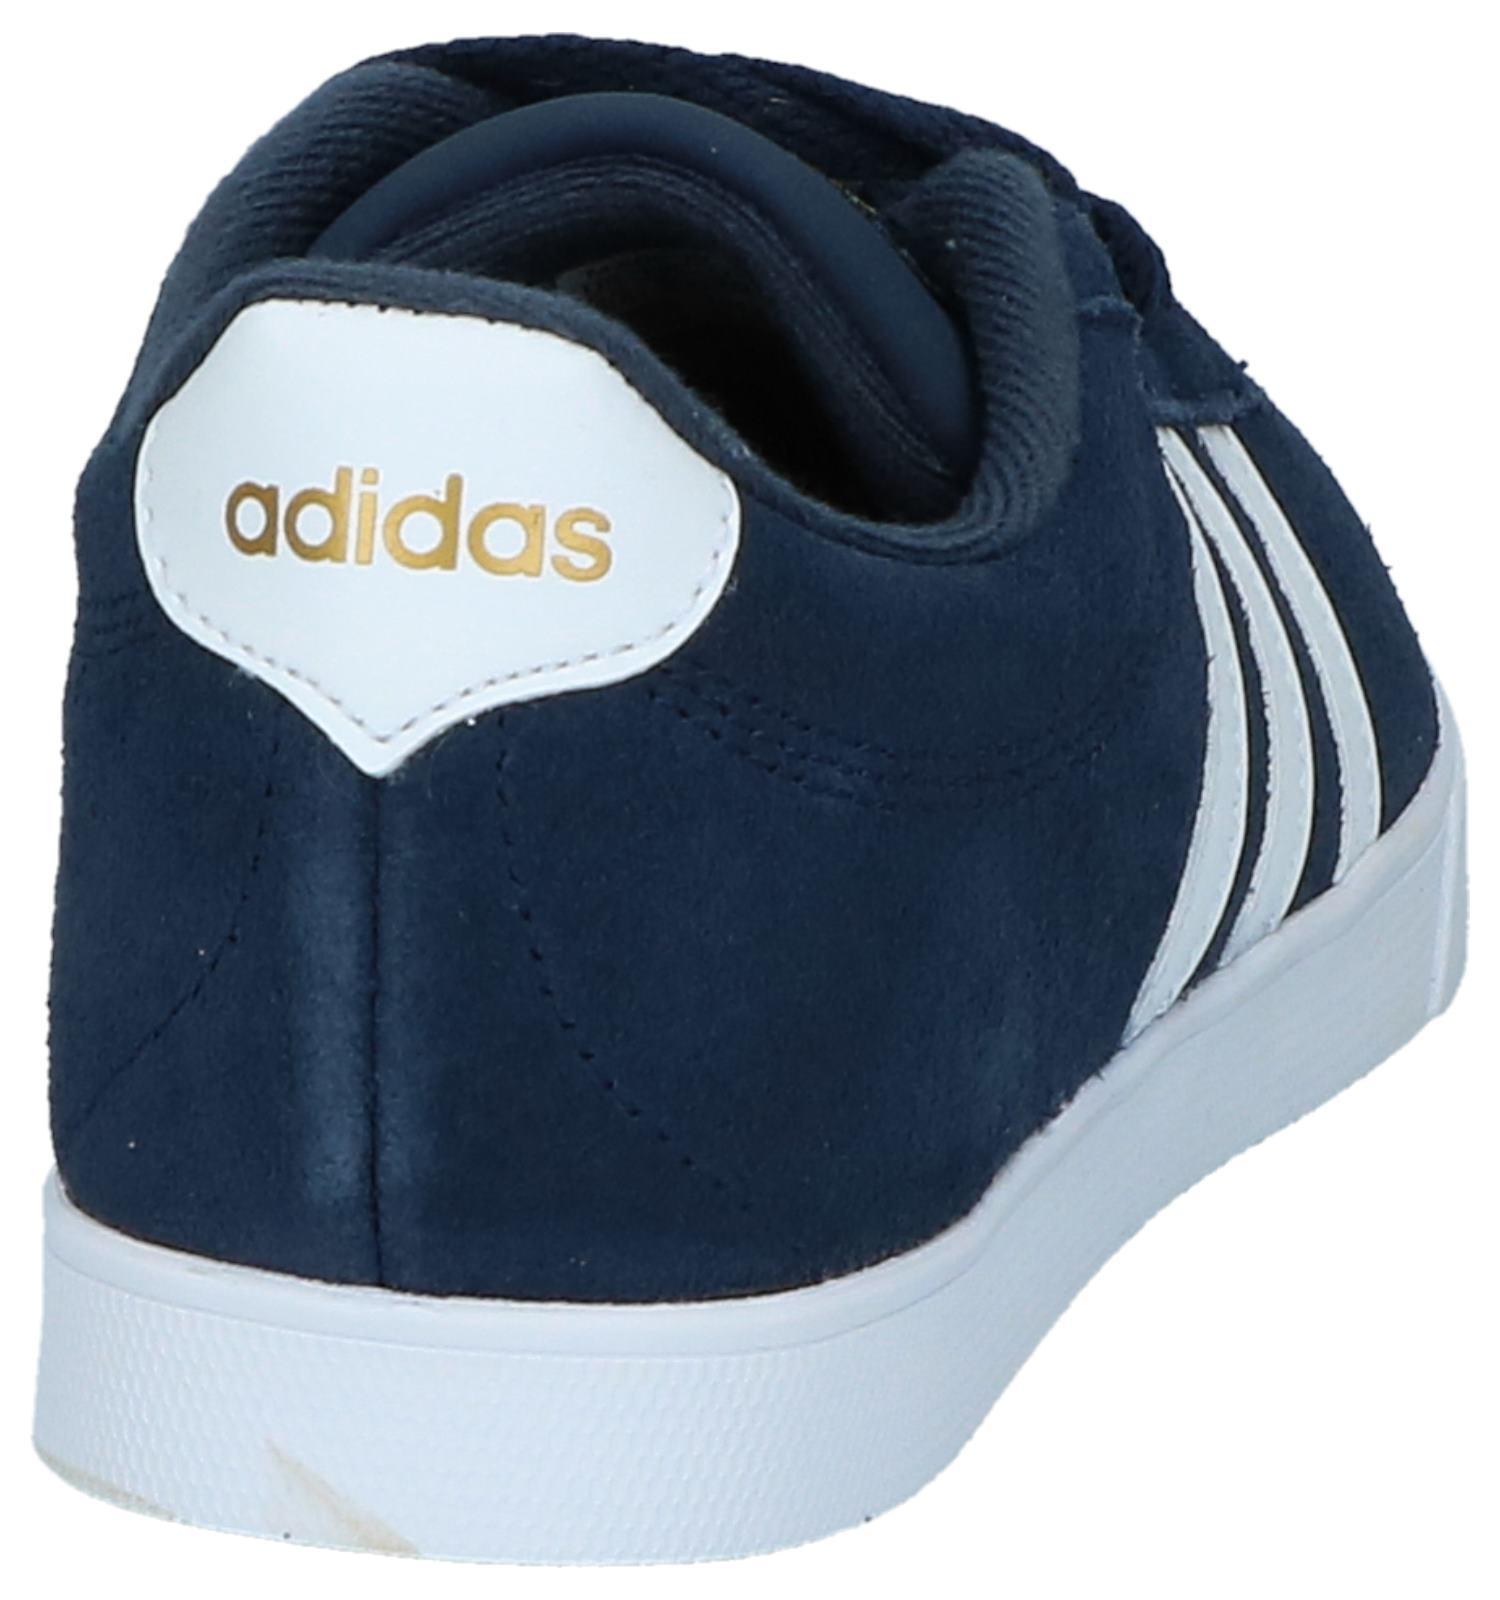 Blauwe Adidas Sneakers Courtset Sneakers Adidas Blauwe Sneakers Courtset Courtset Blauwe Adidas VqzGUpSM